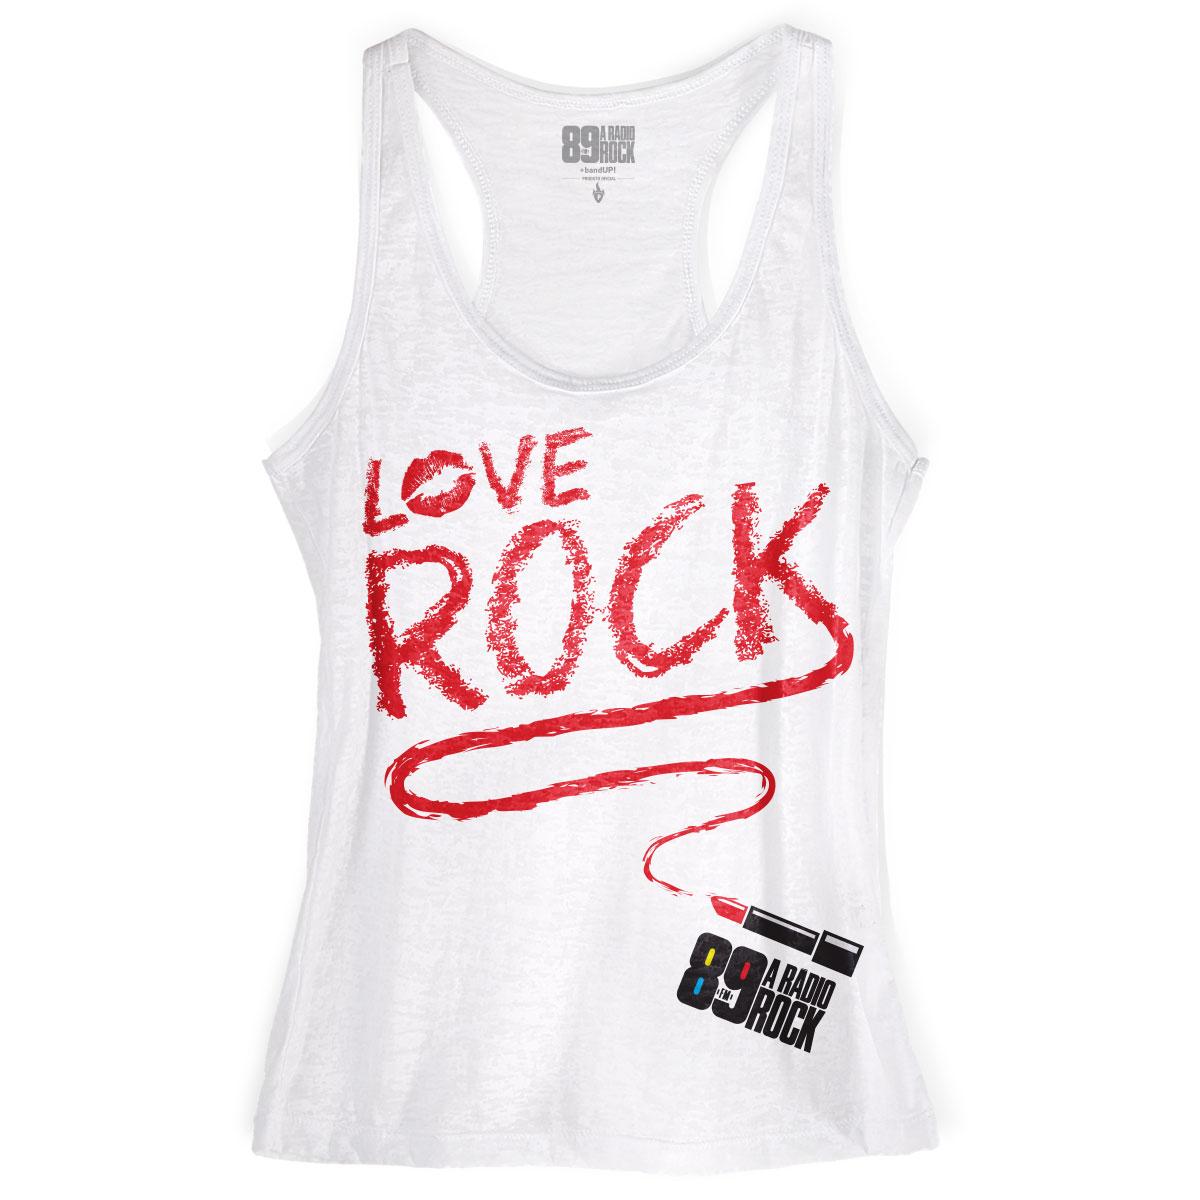 Regata Nadador Feminina 89FM Love Rock